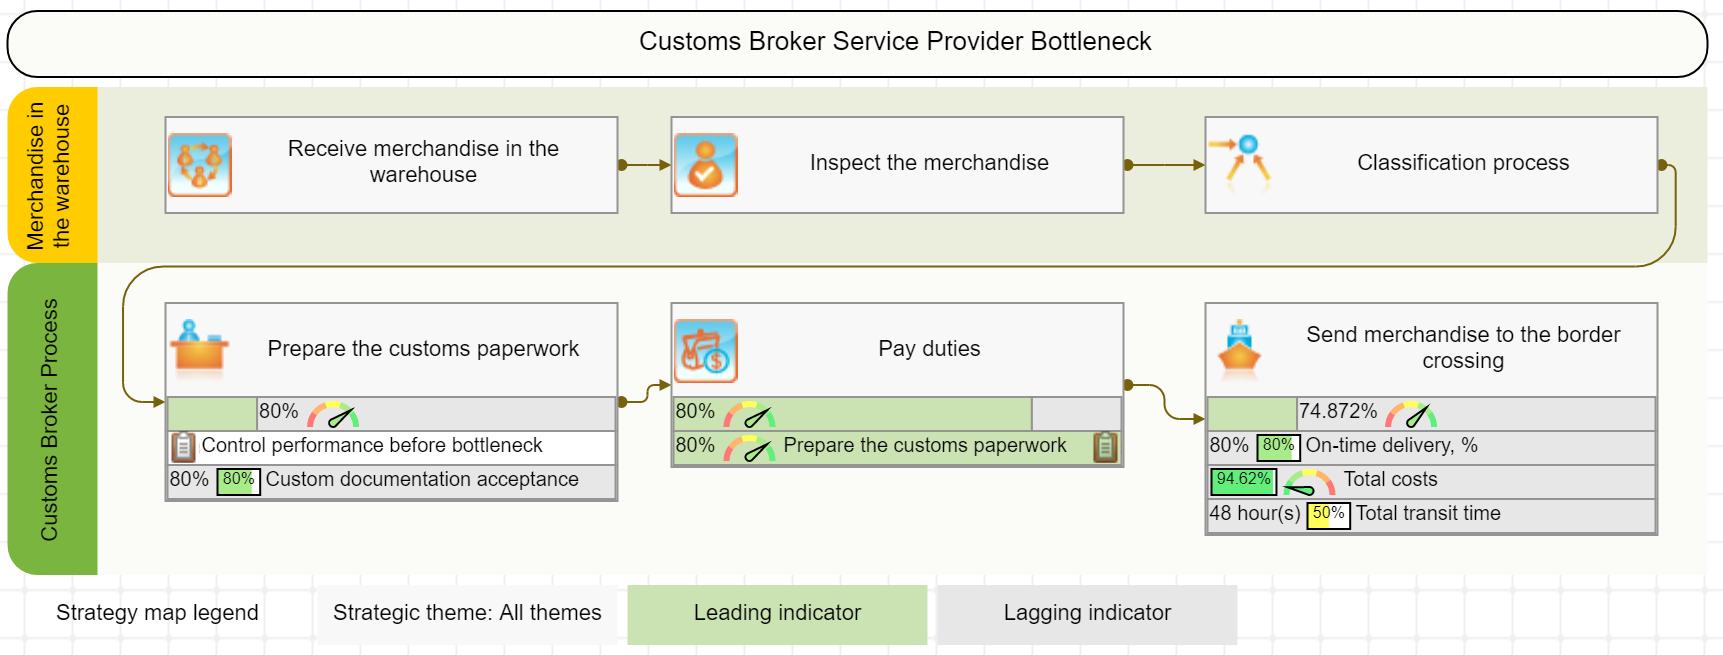 Process map for Customs Broker Service Provider Bottleneck